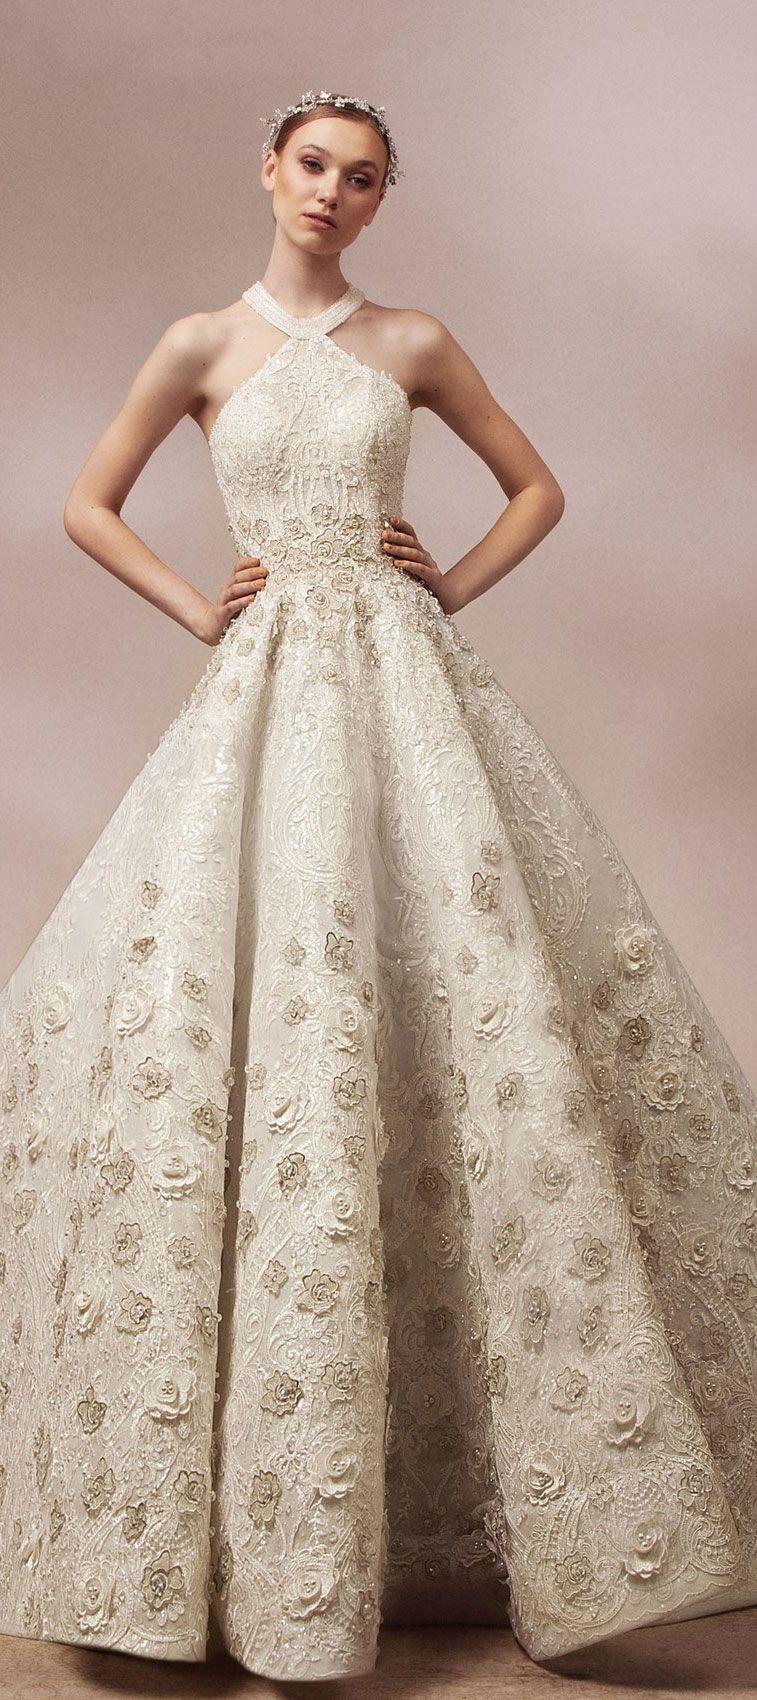 High fashion wedding dress inspiration